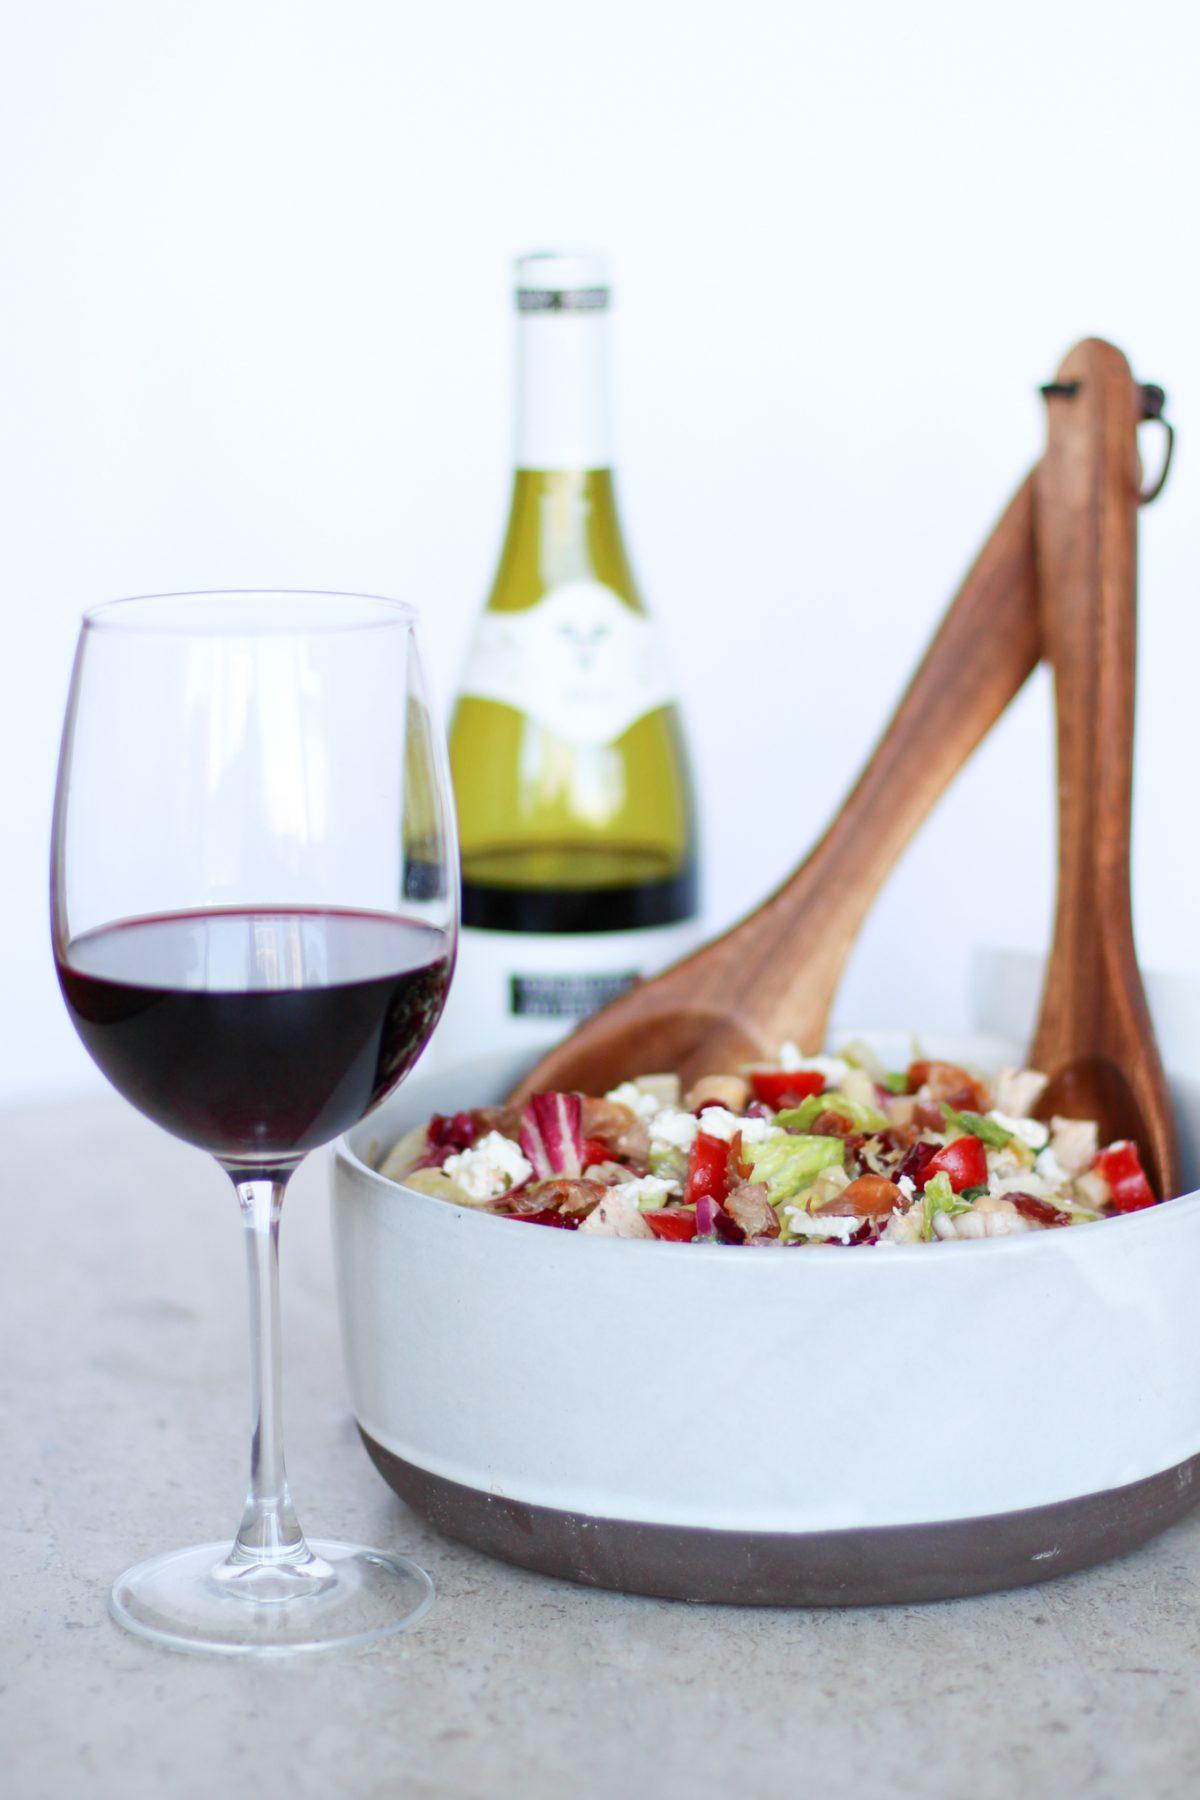 Hearty Chopped Salad and Beaujolais Wine